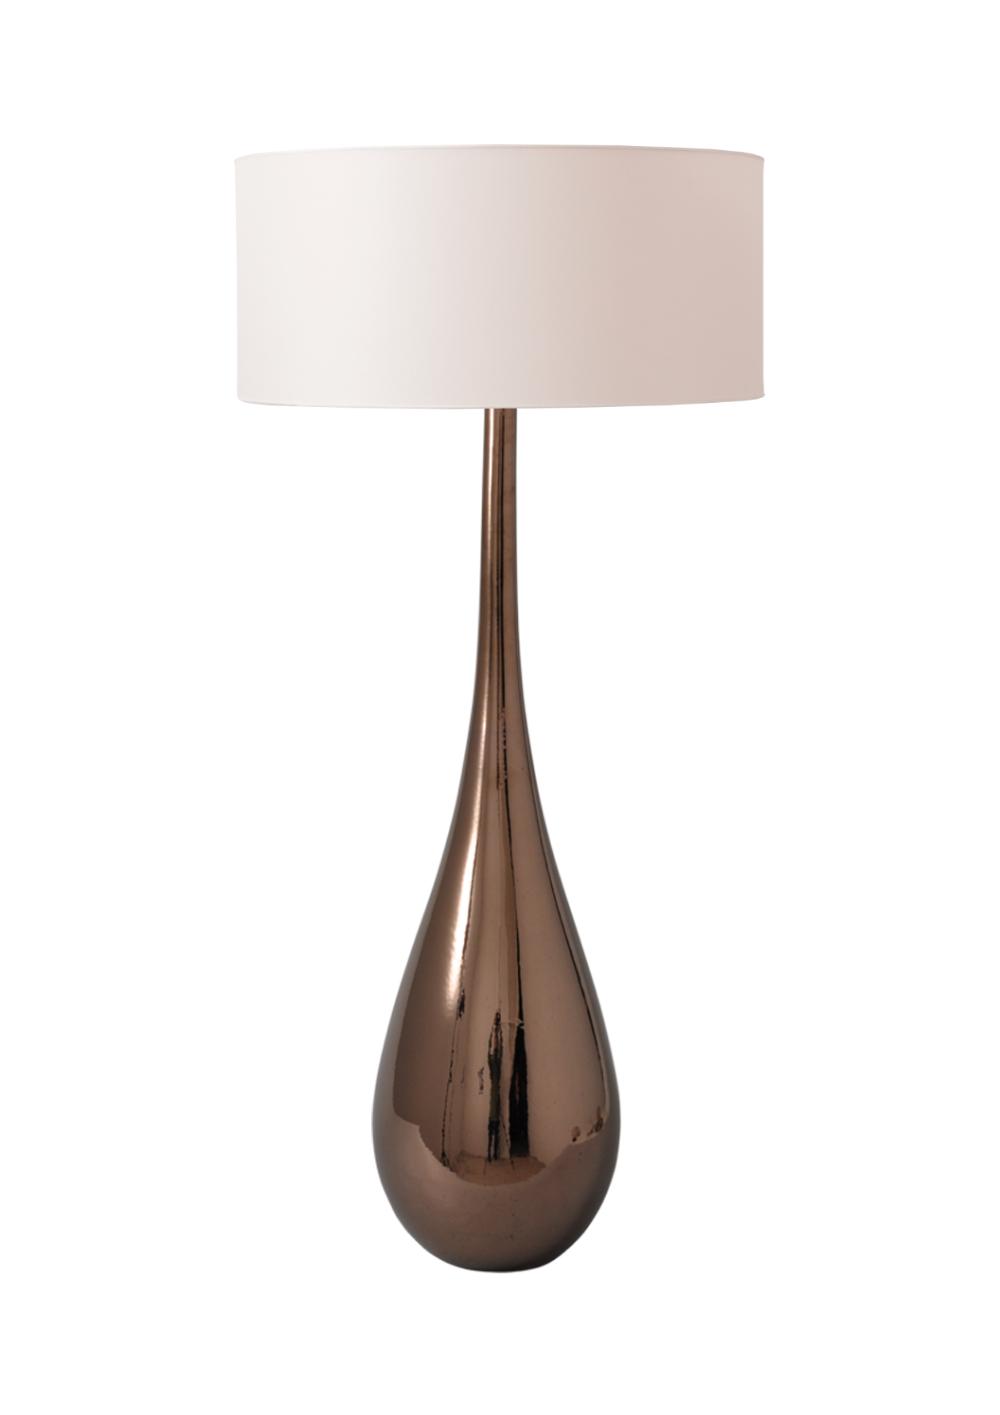 Floor lamp Ginevra